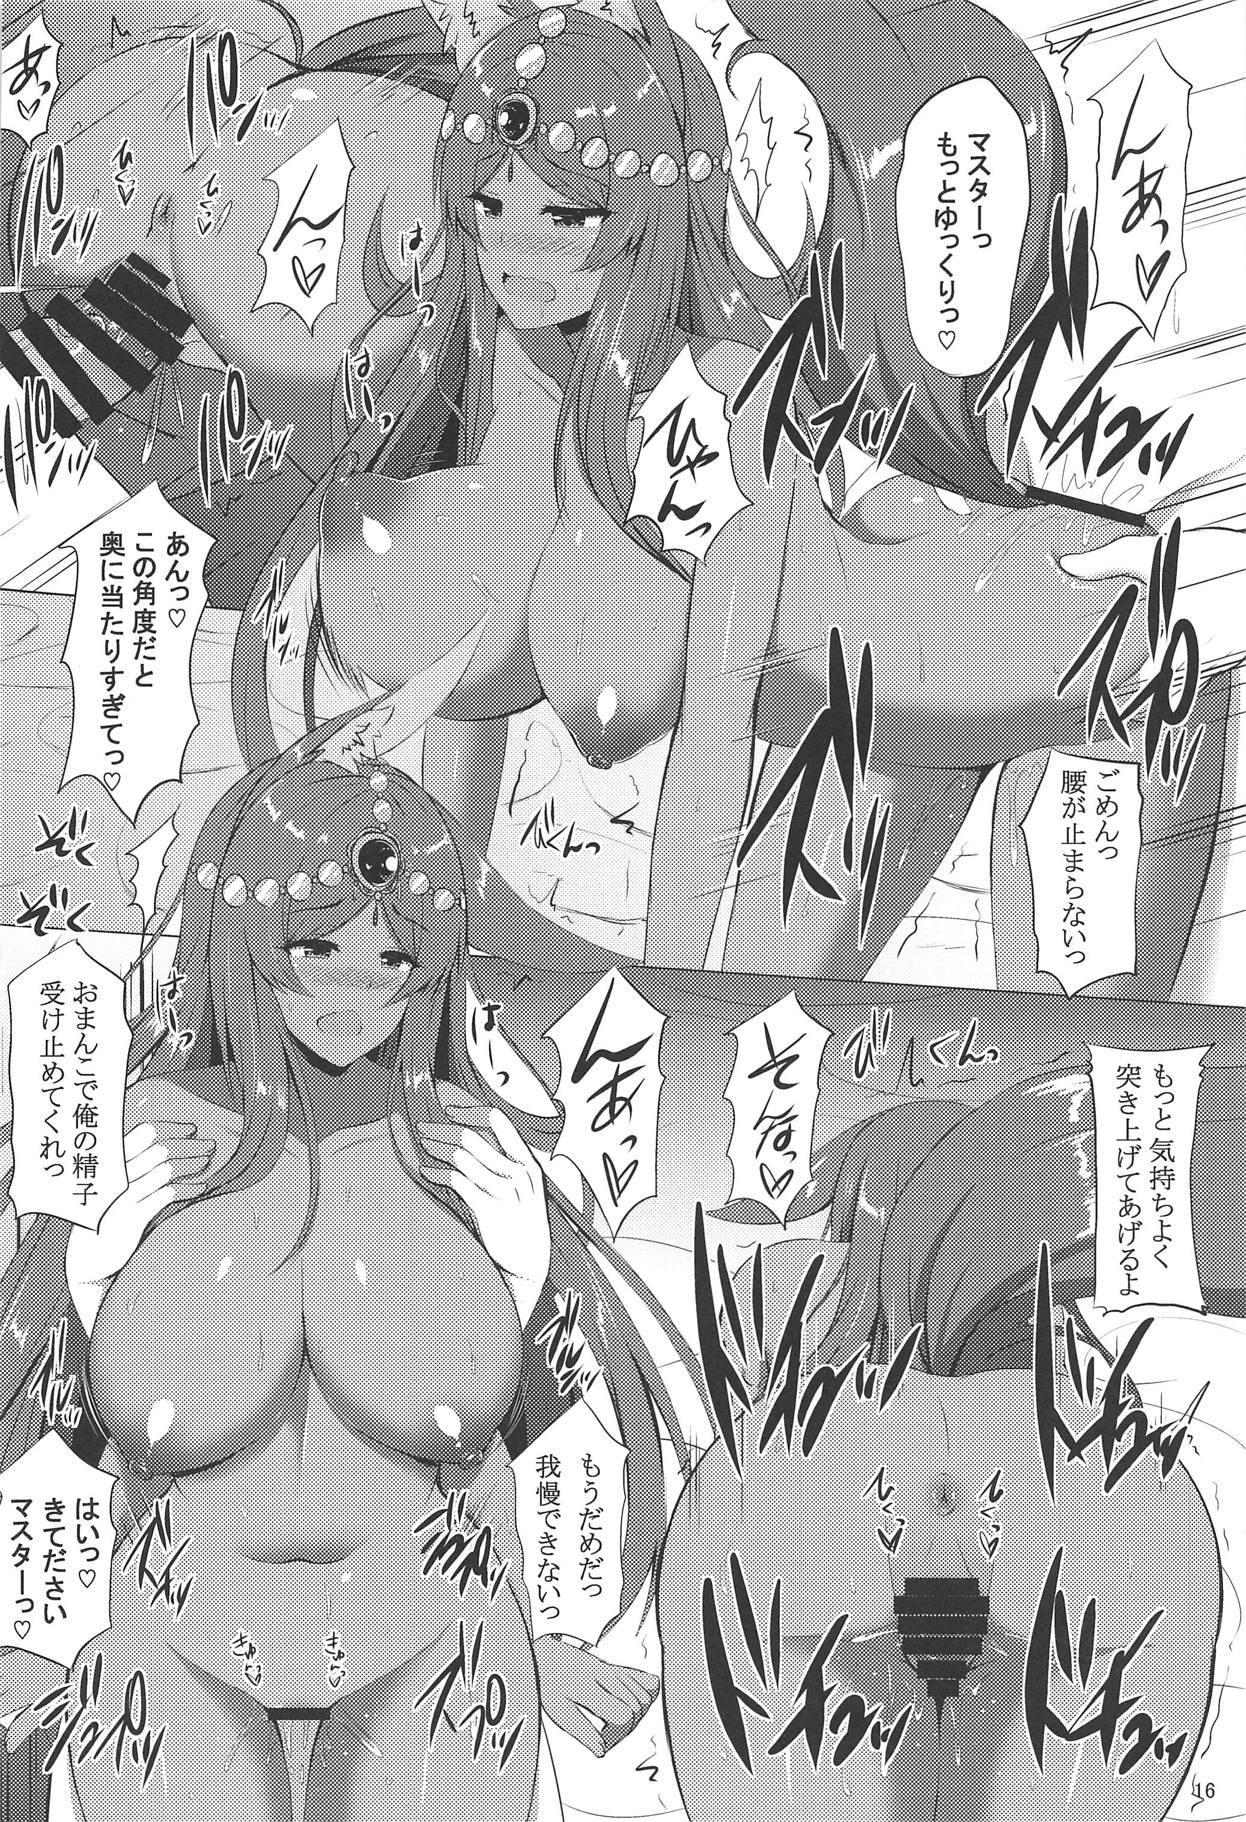 MidCas-san to Kashikiri Rotenburo 14